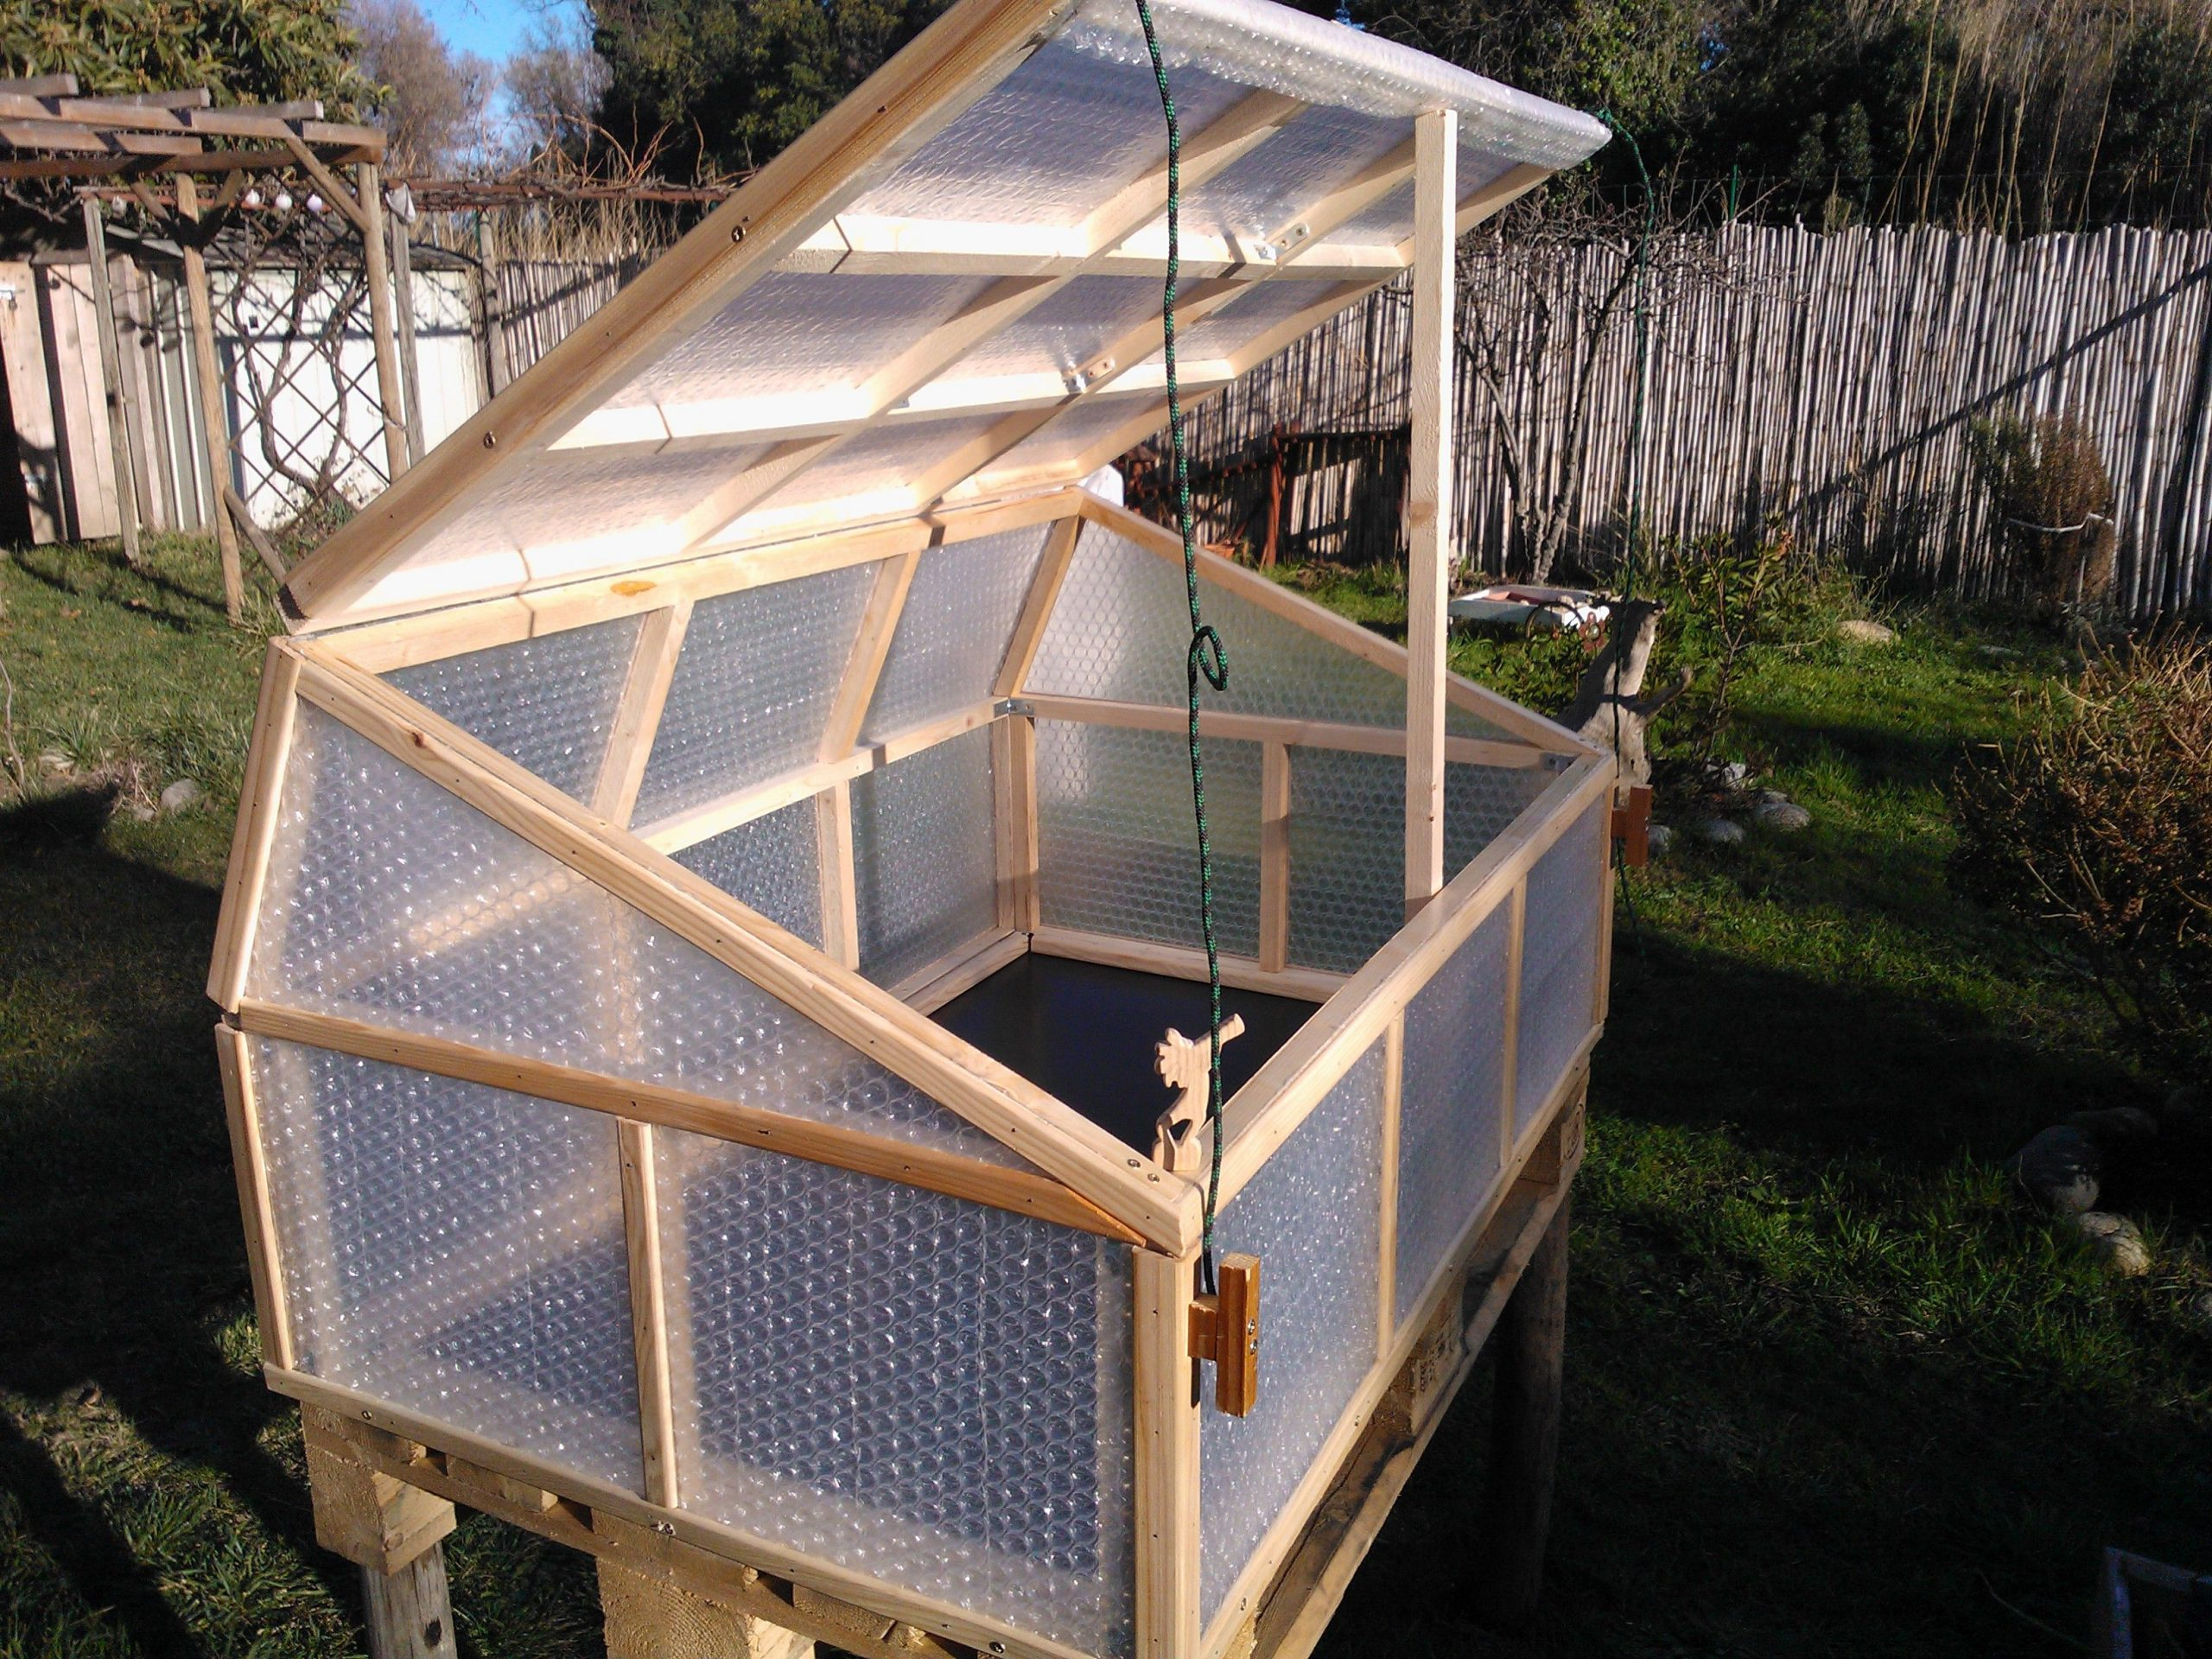 Fabrication D'une Mini Serre. | Serre Jardin, Mini Serre ... avec Fabriquer Une Mini Serre De Jardin